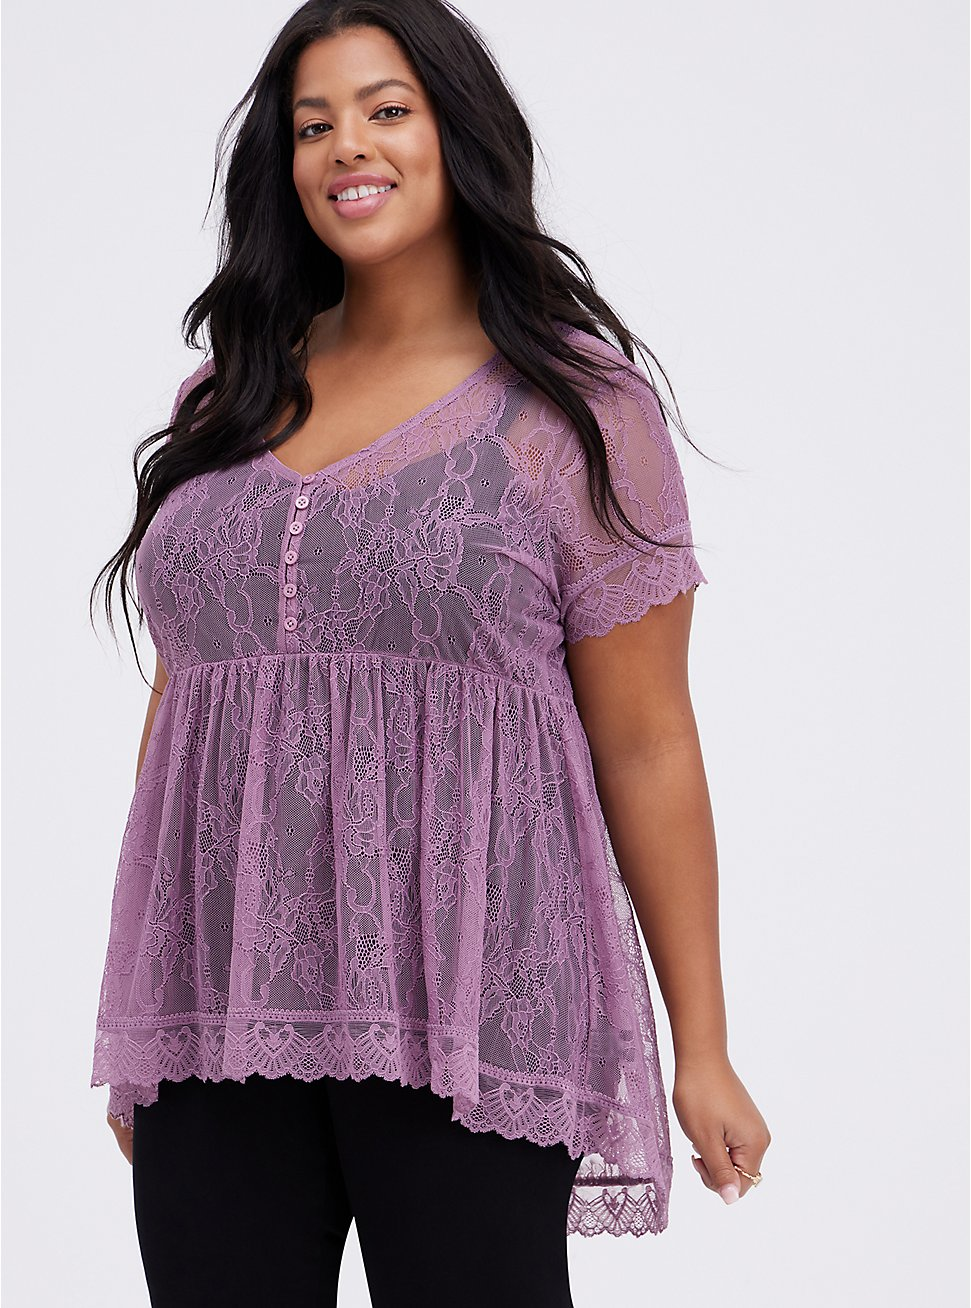 Babydoll Top - Lace Purple, PURPLE, hi-res